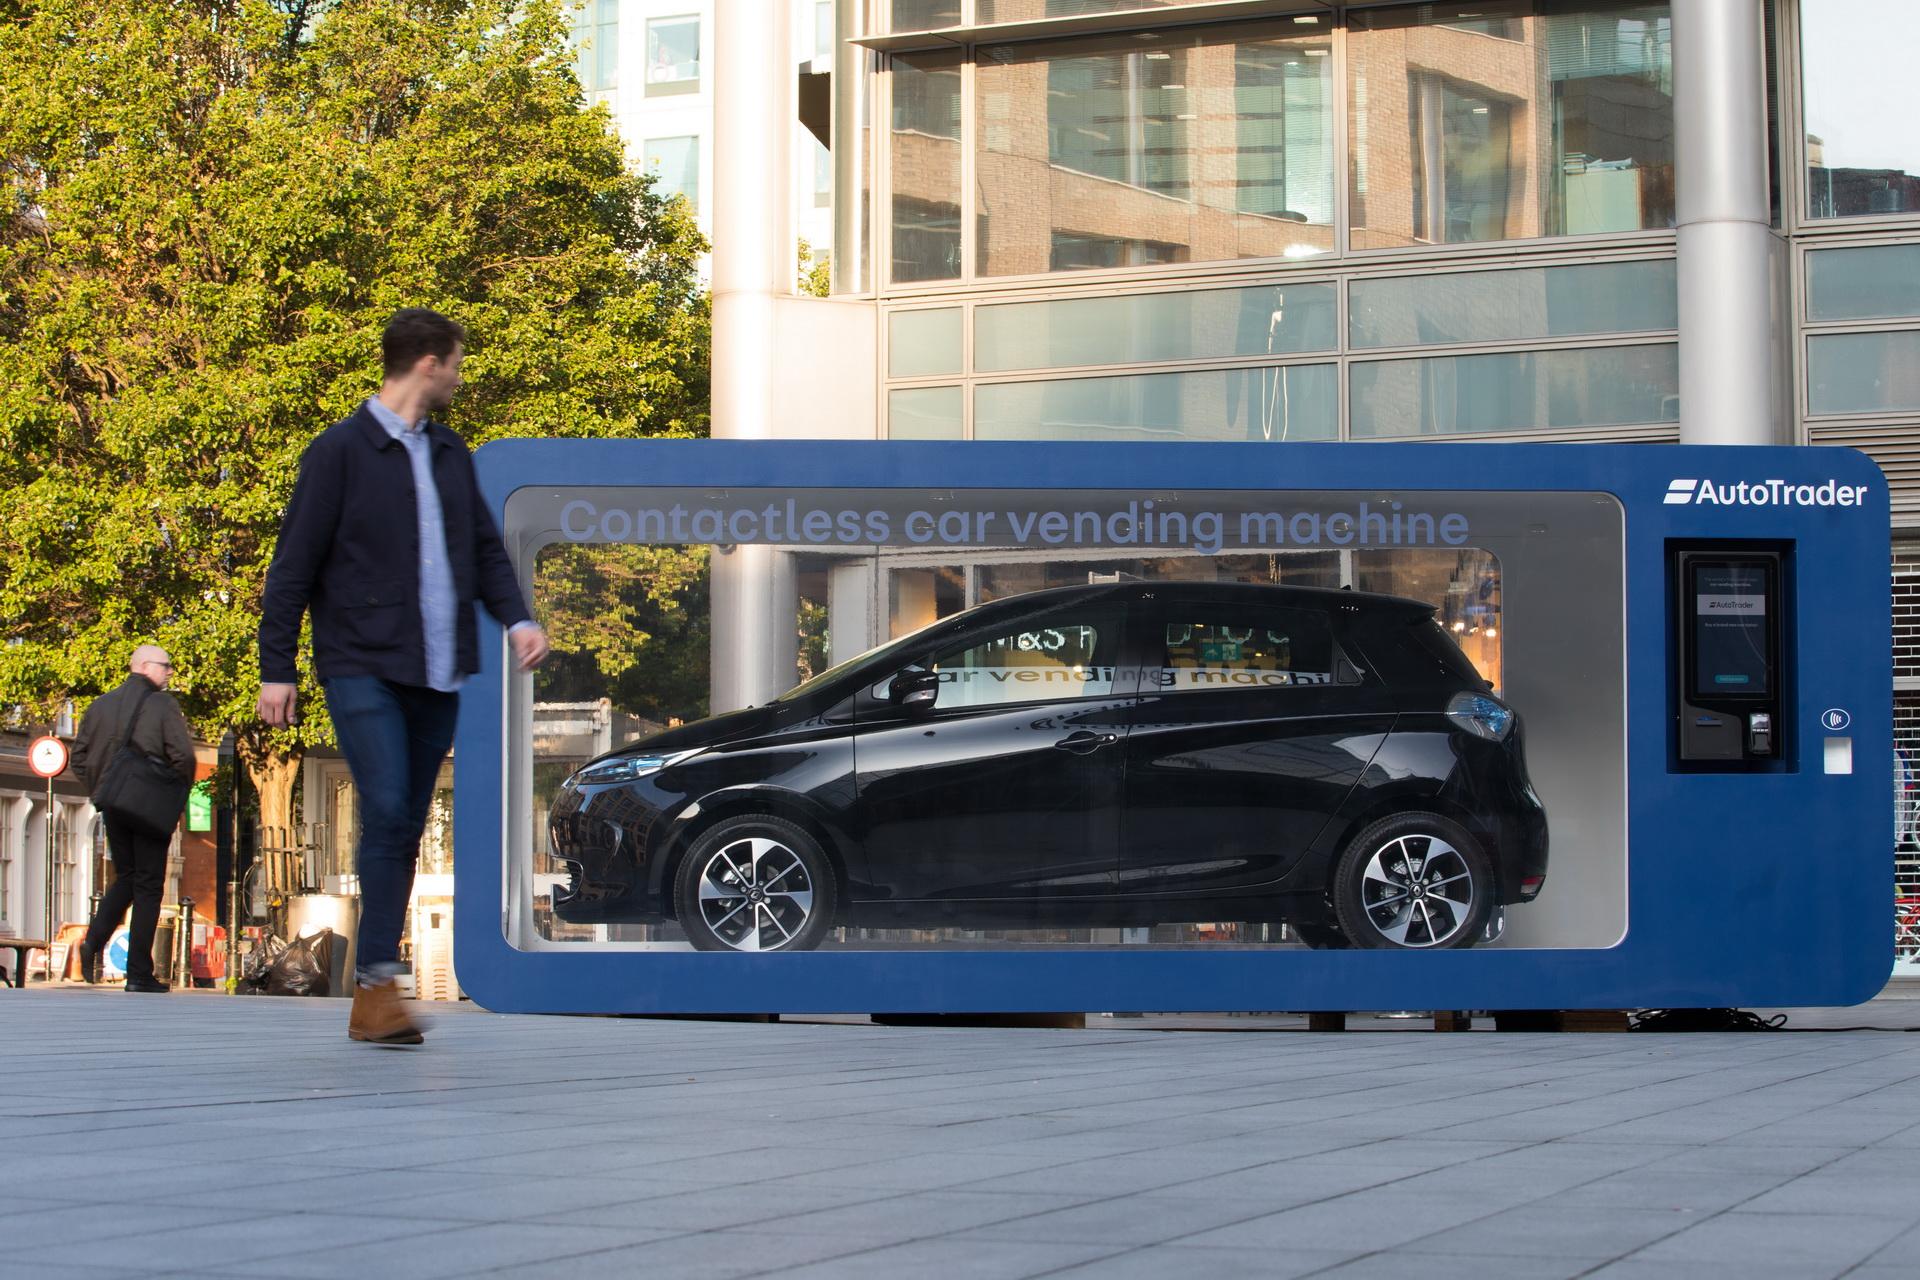 0baf47cb-car-vending-machine-london-3